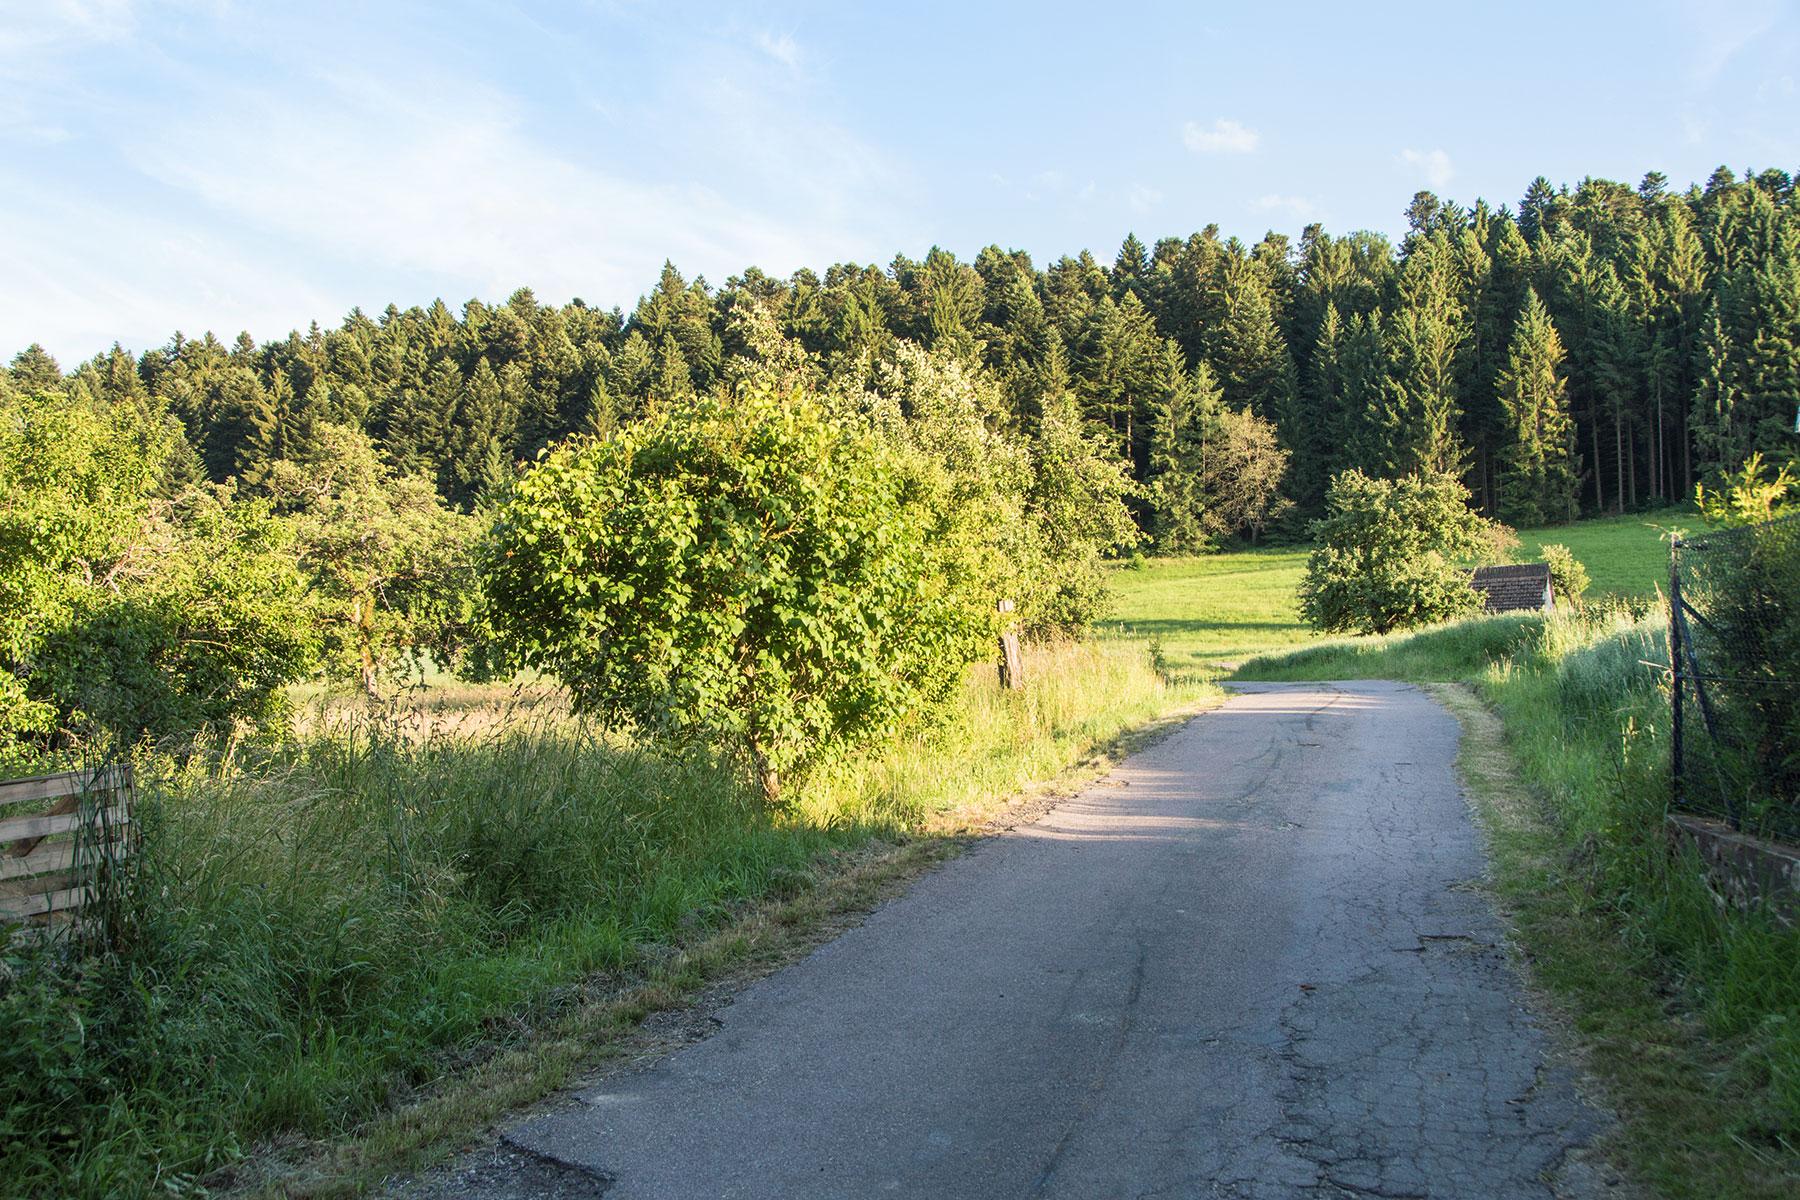 Urlaub-Schwarzwald-Juli-02